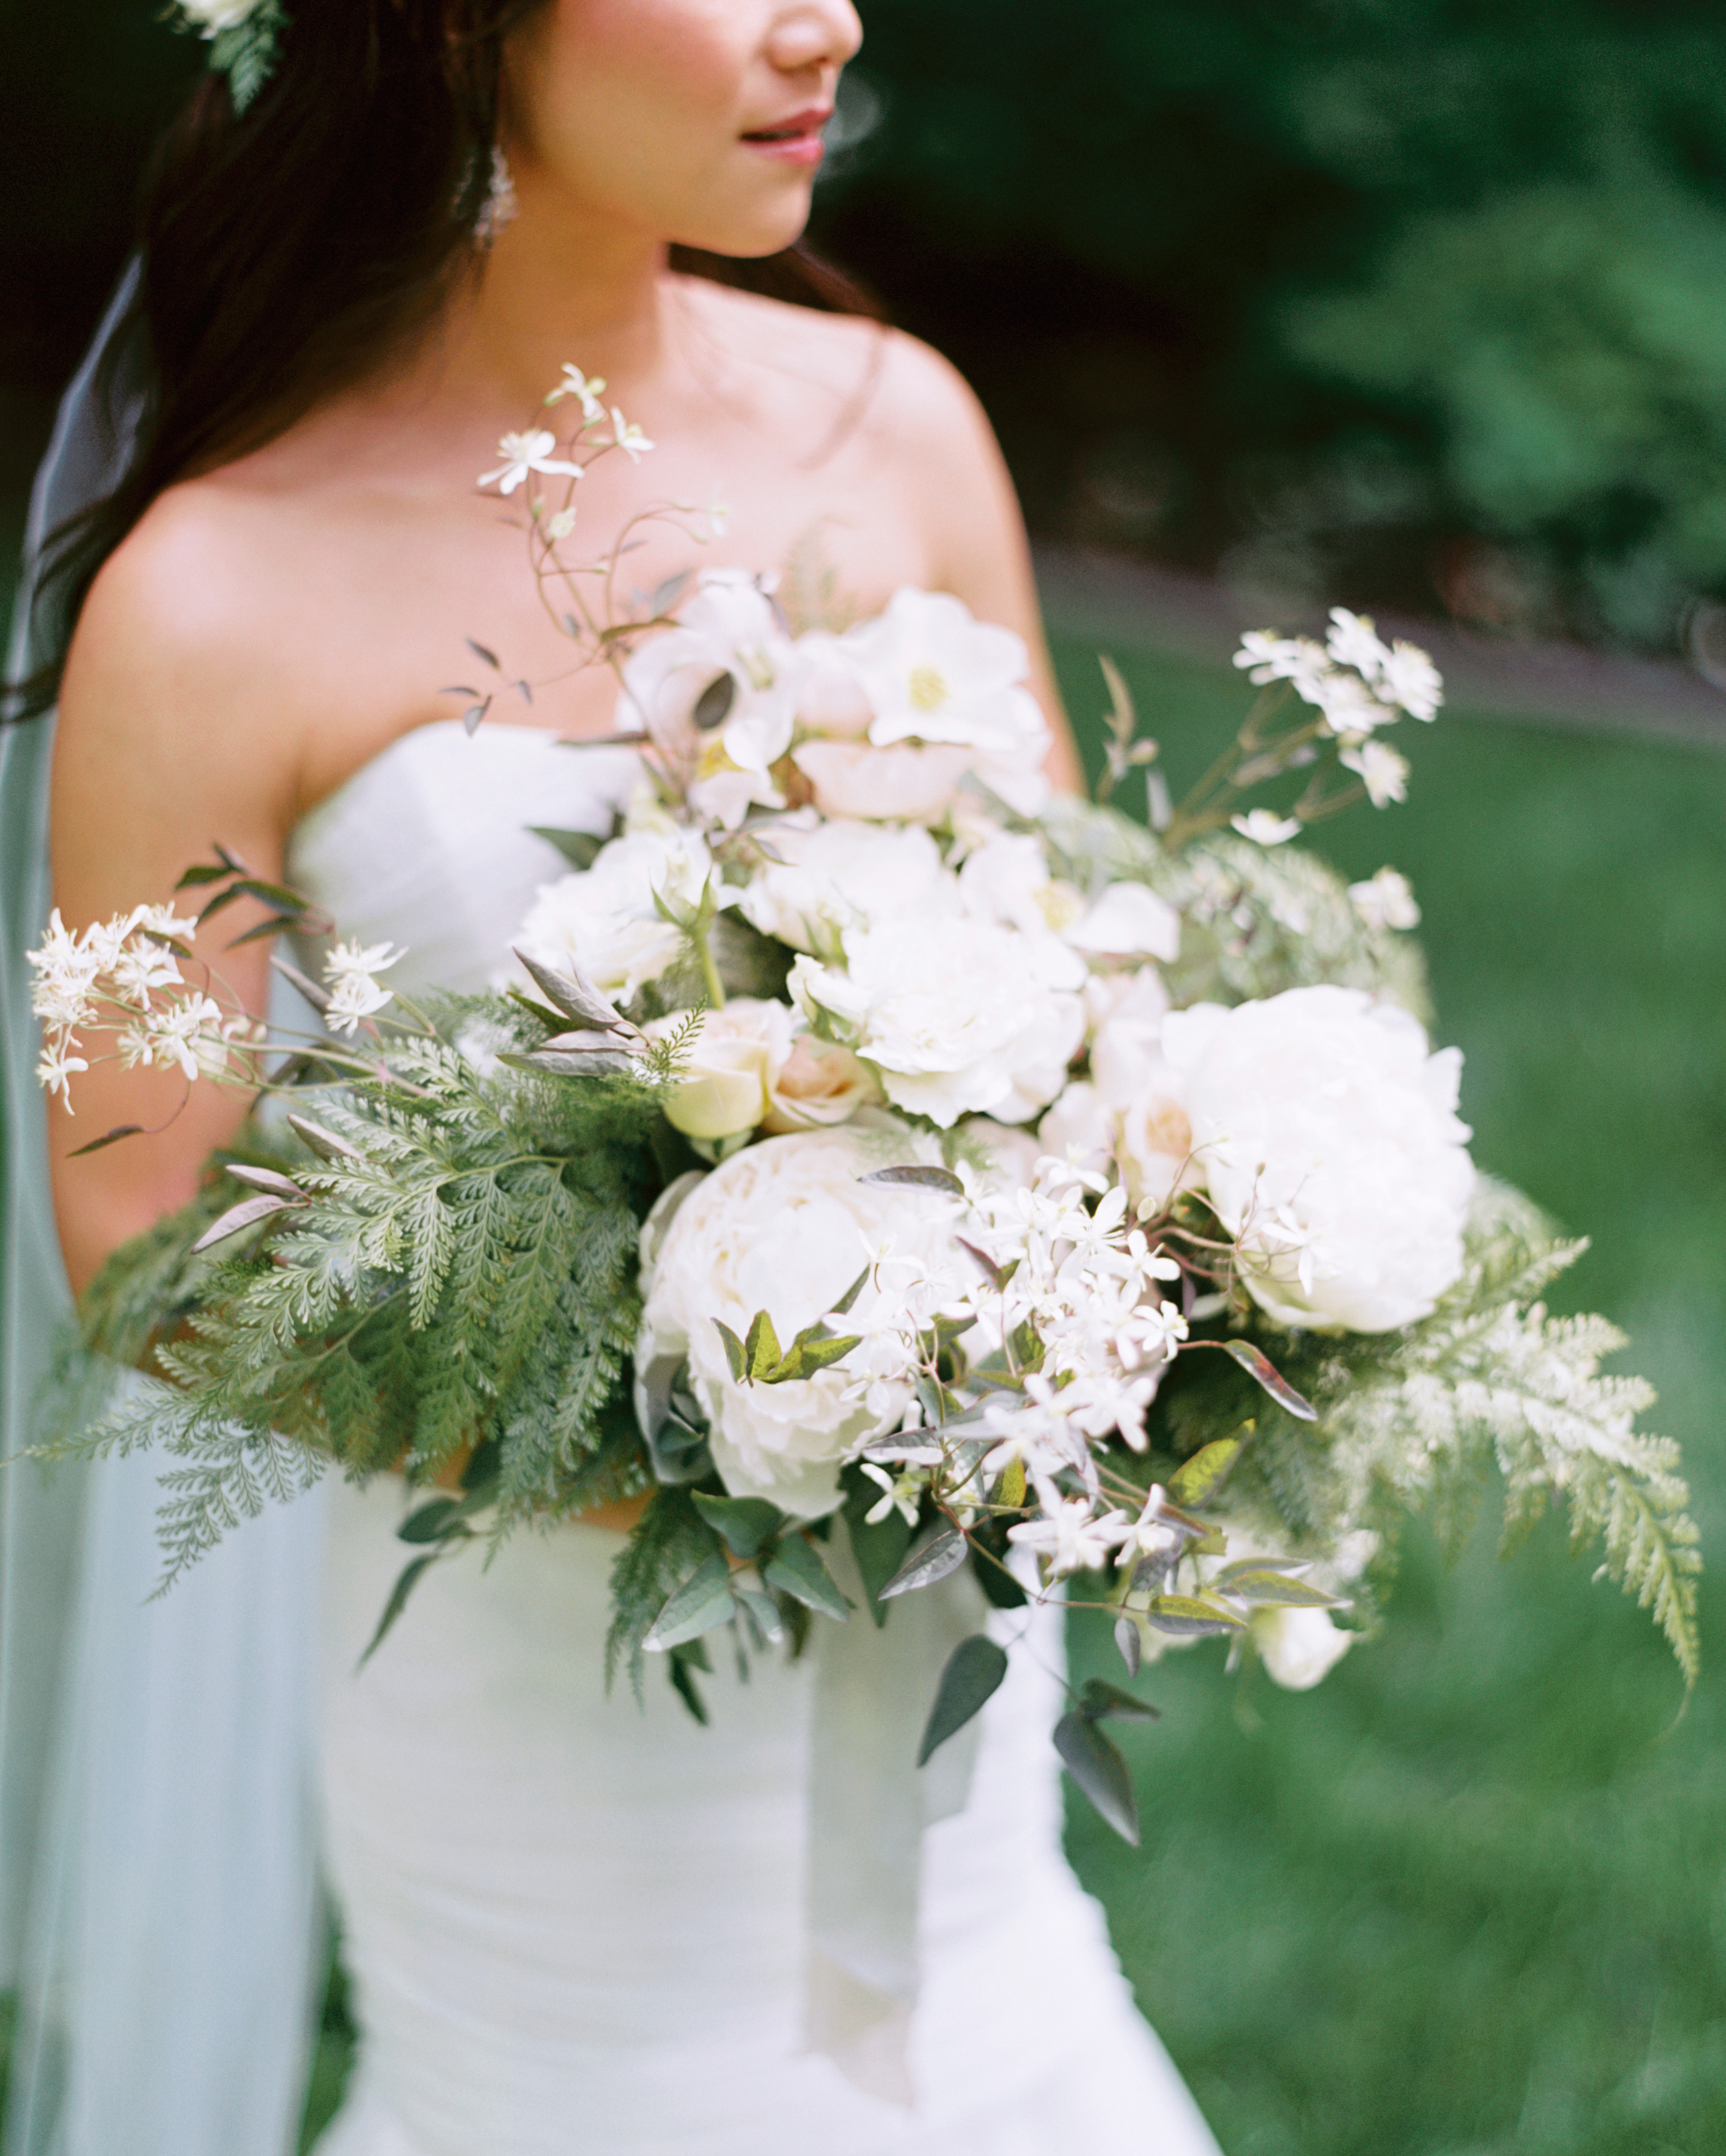 ally-adam-wedding-bouquet-008-s111818-0215.jpg